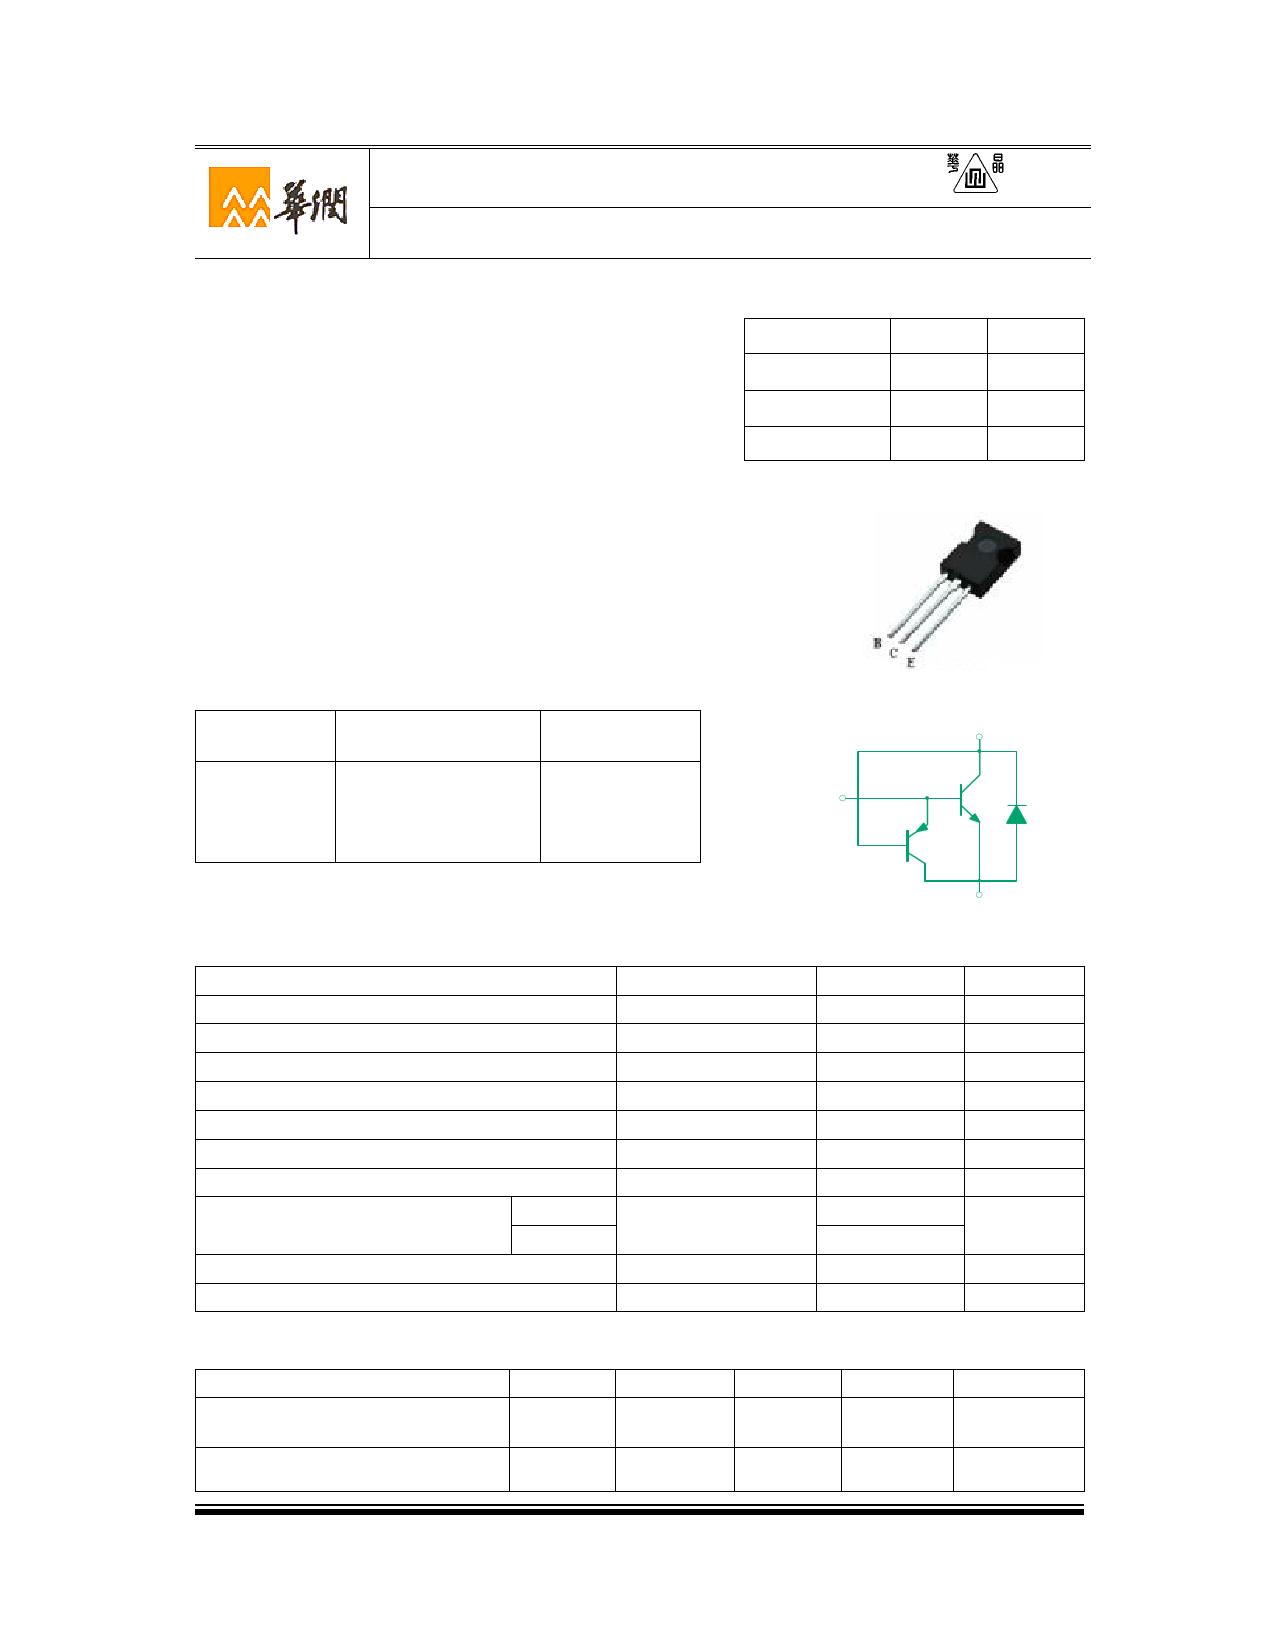 3DD127D datasheet pinout